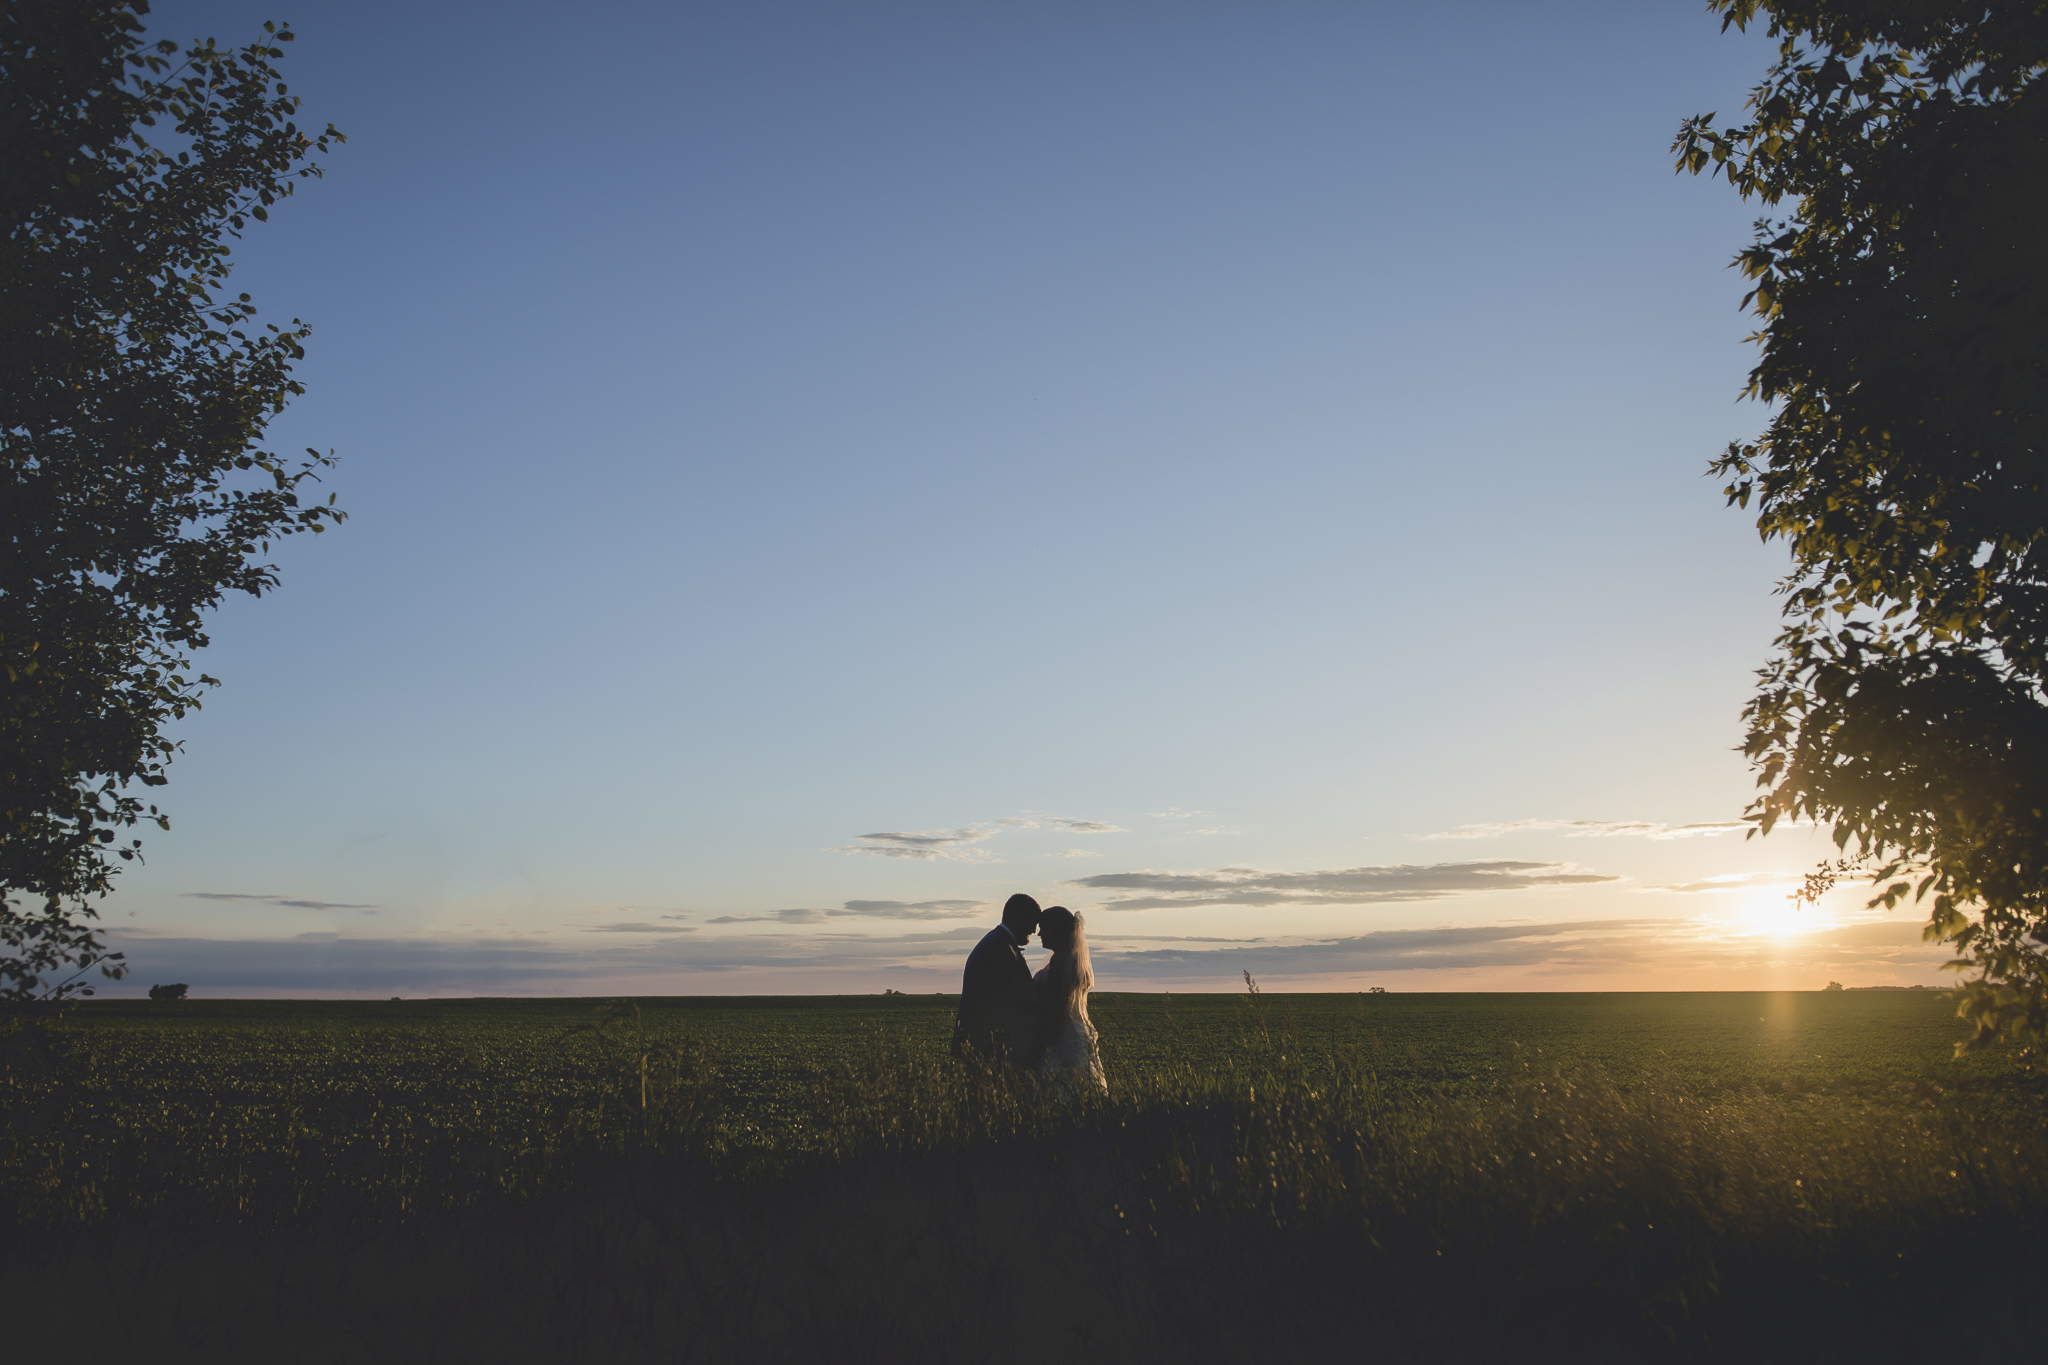 minnesota family farm outdoor wedding photographer-10.jpg